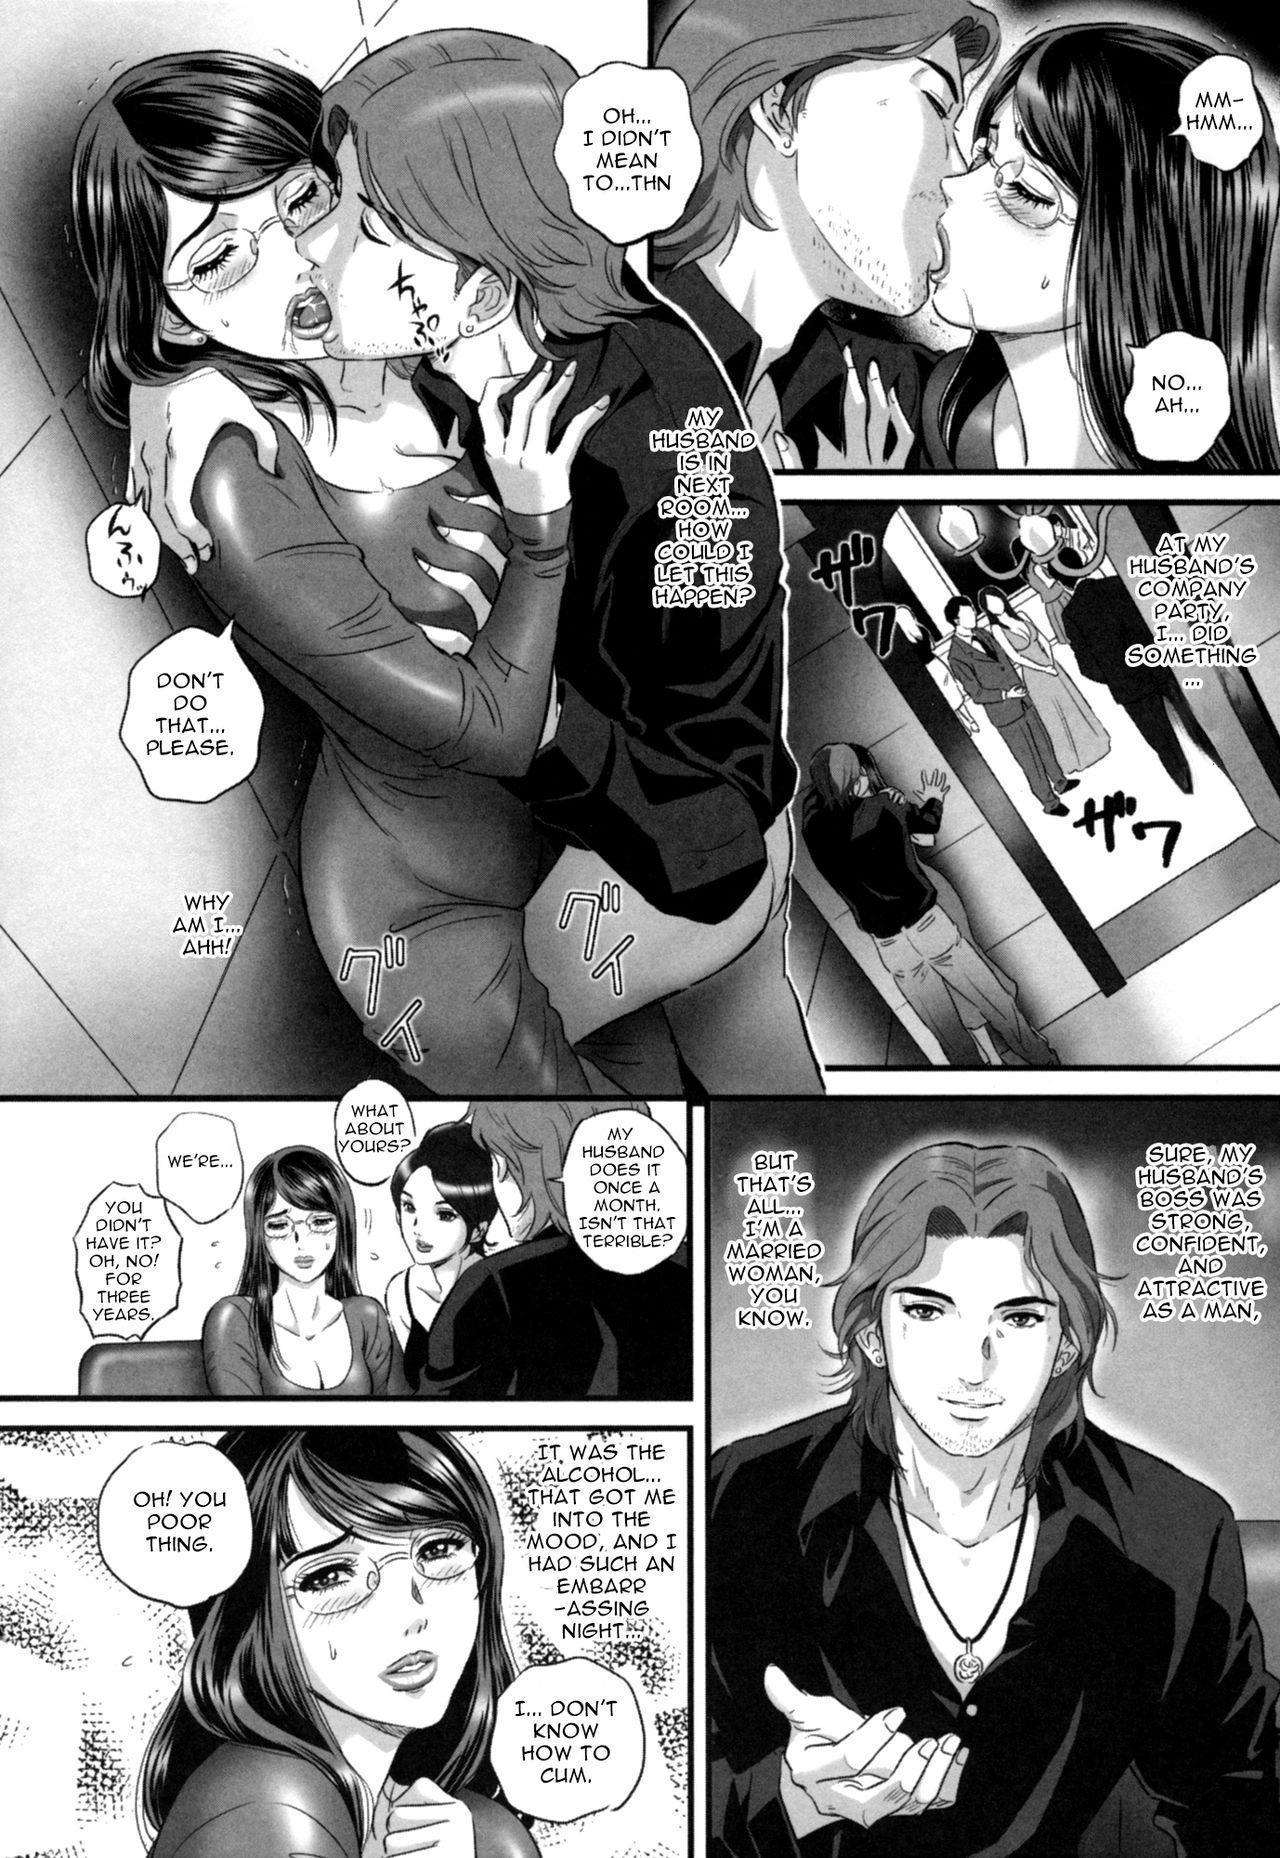 [MON-MON] Inmoraru ~aru hitodzuma no kaika~   Immoral ~Blossoming of a Married Woman~ (Ori no Naka no Ingi) [English] 1